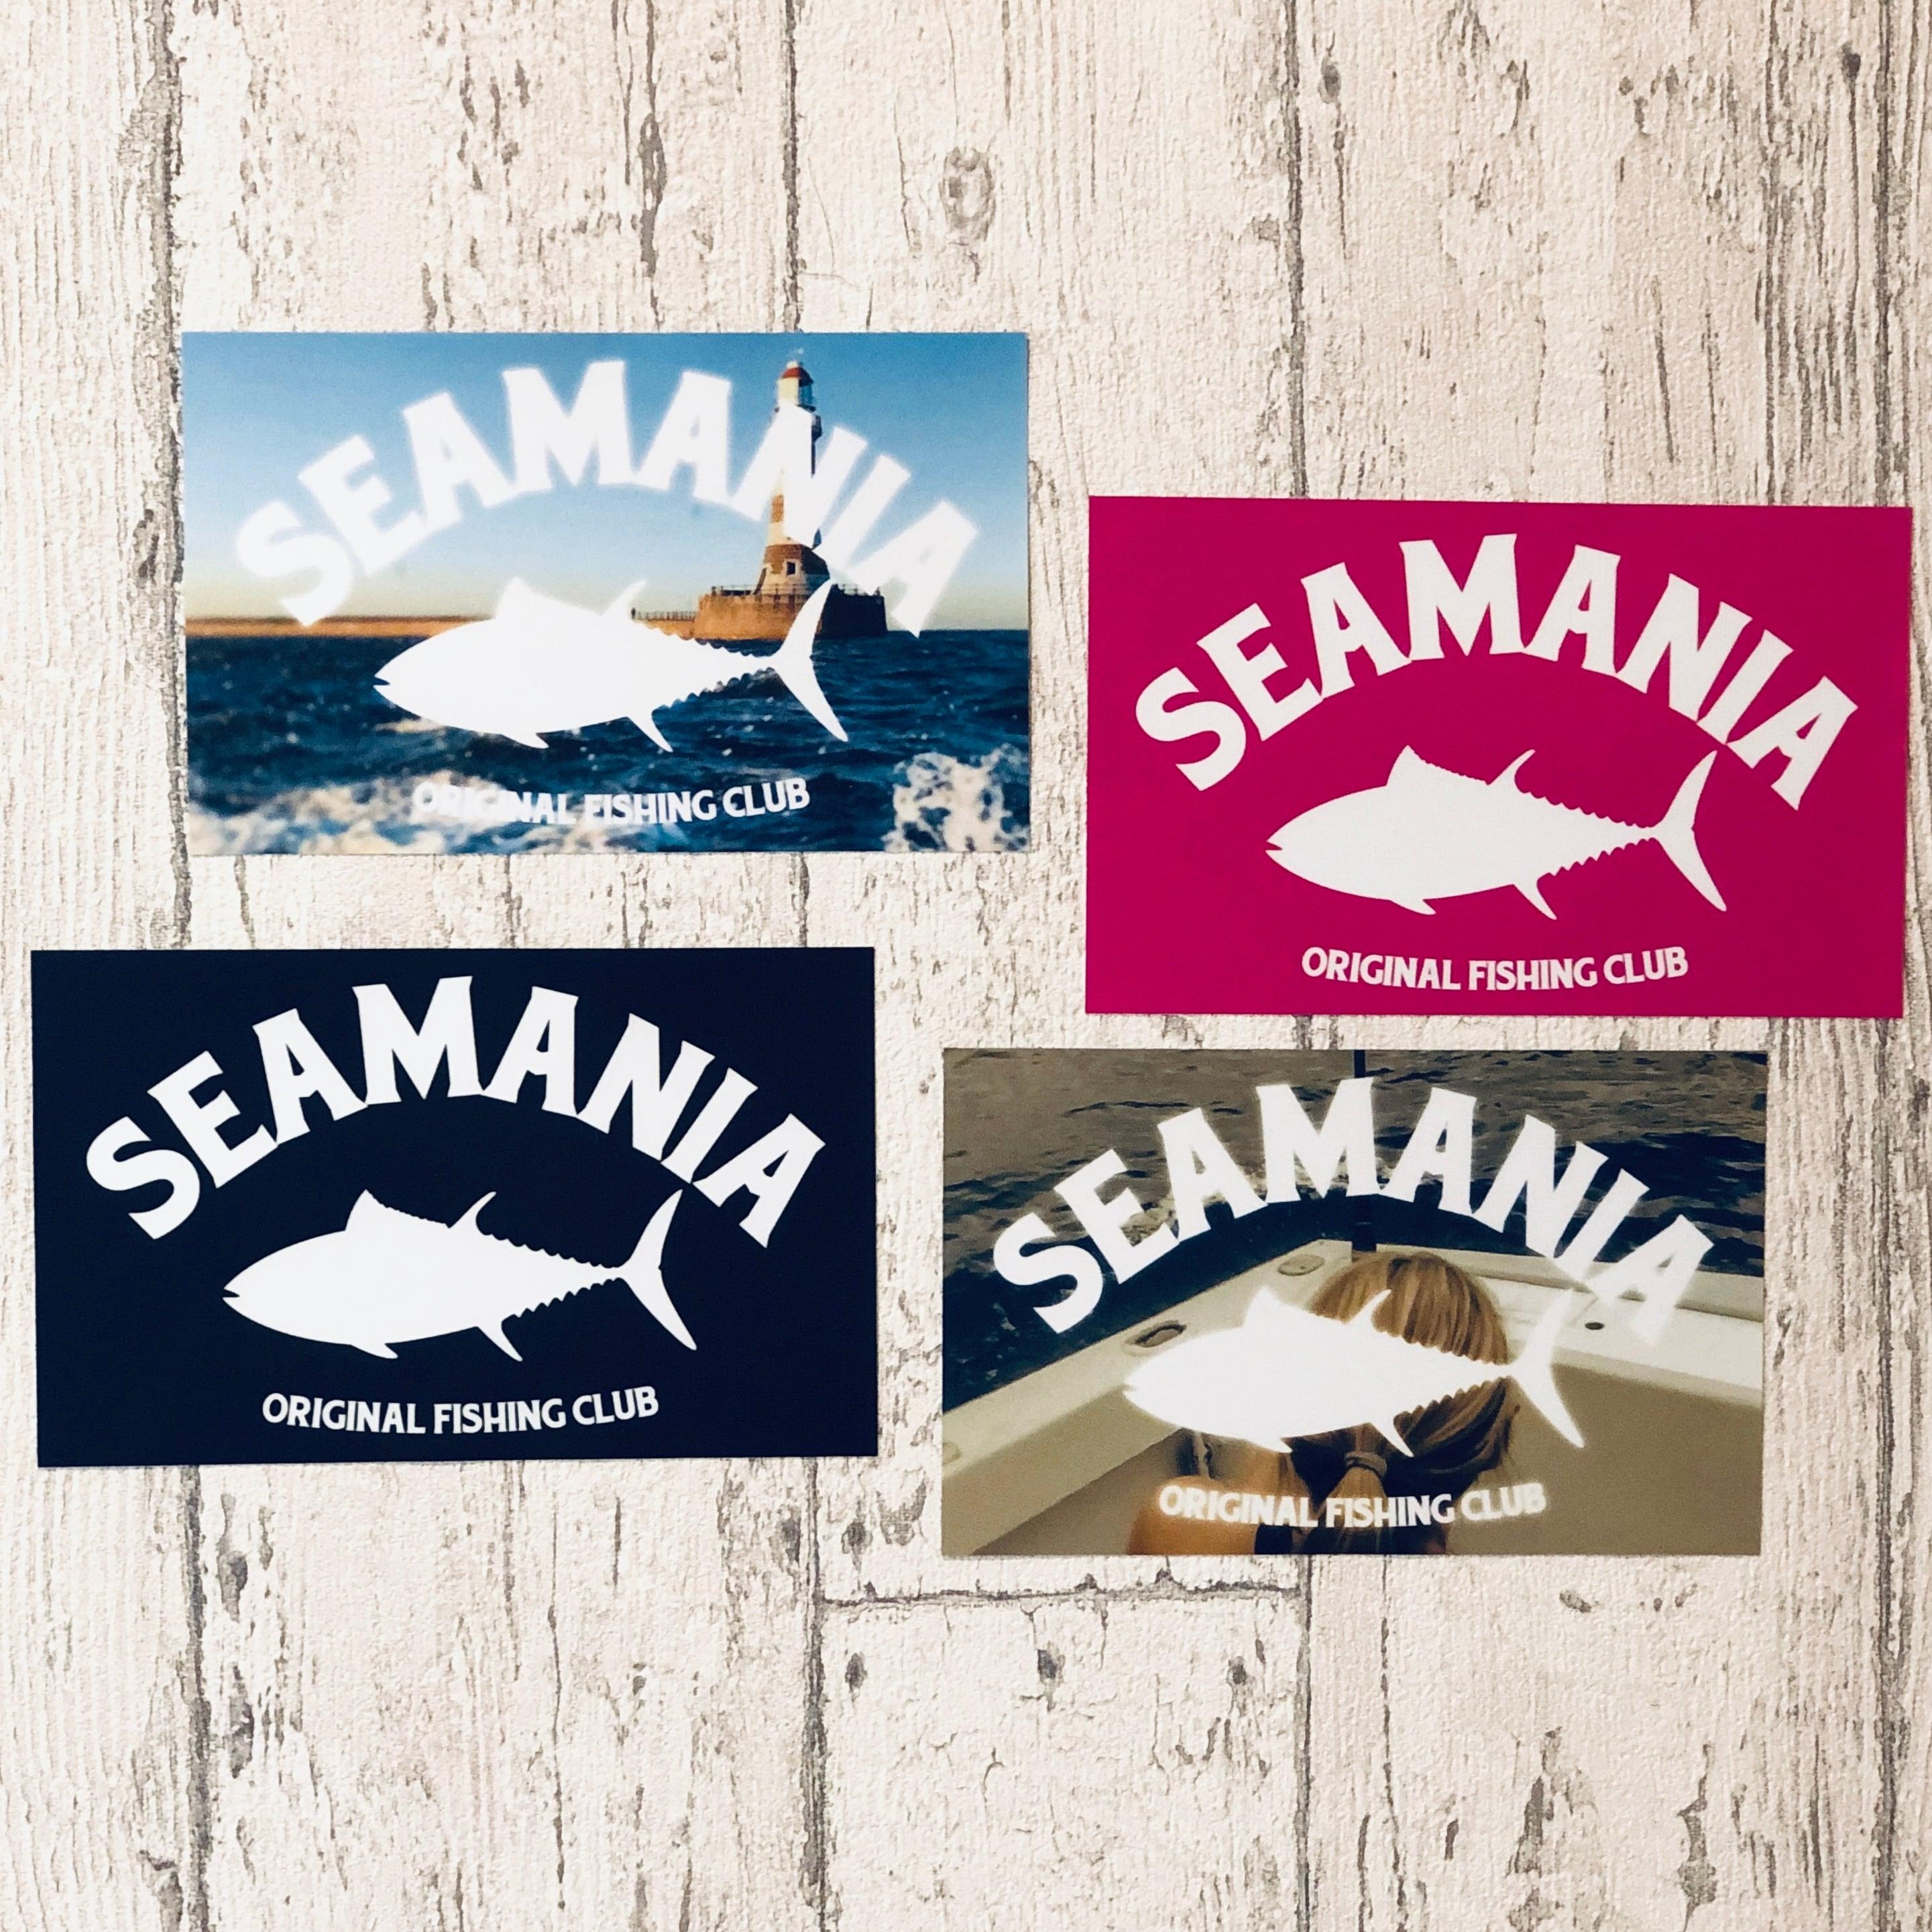 【Seamania】ロゴデザインステッカー